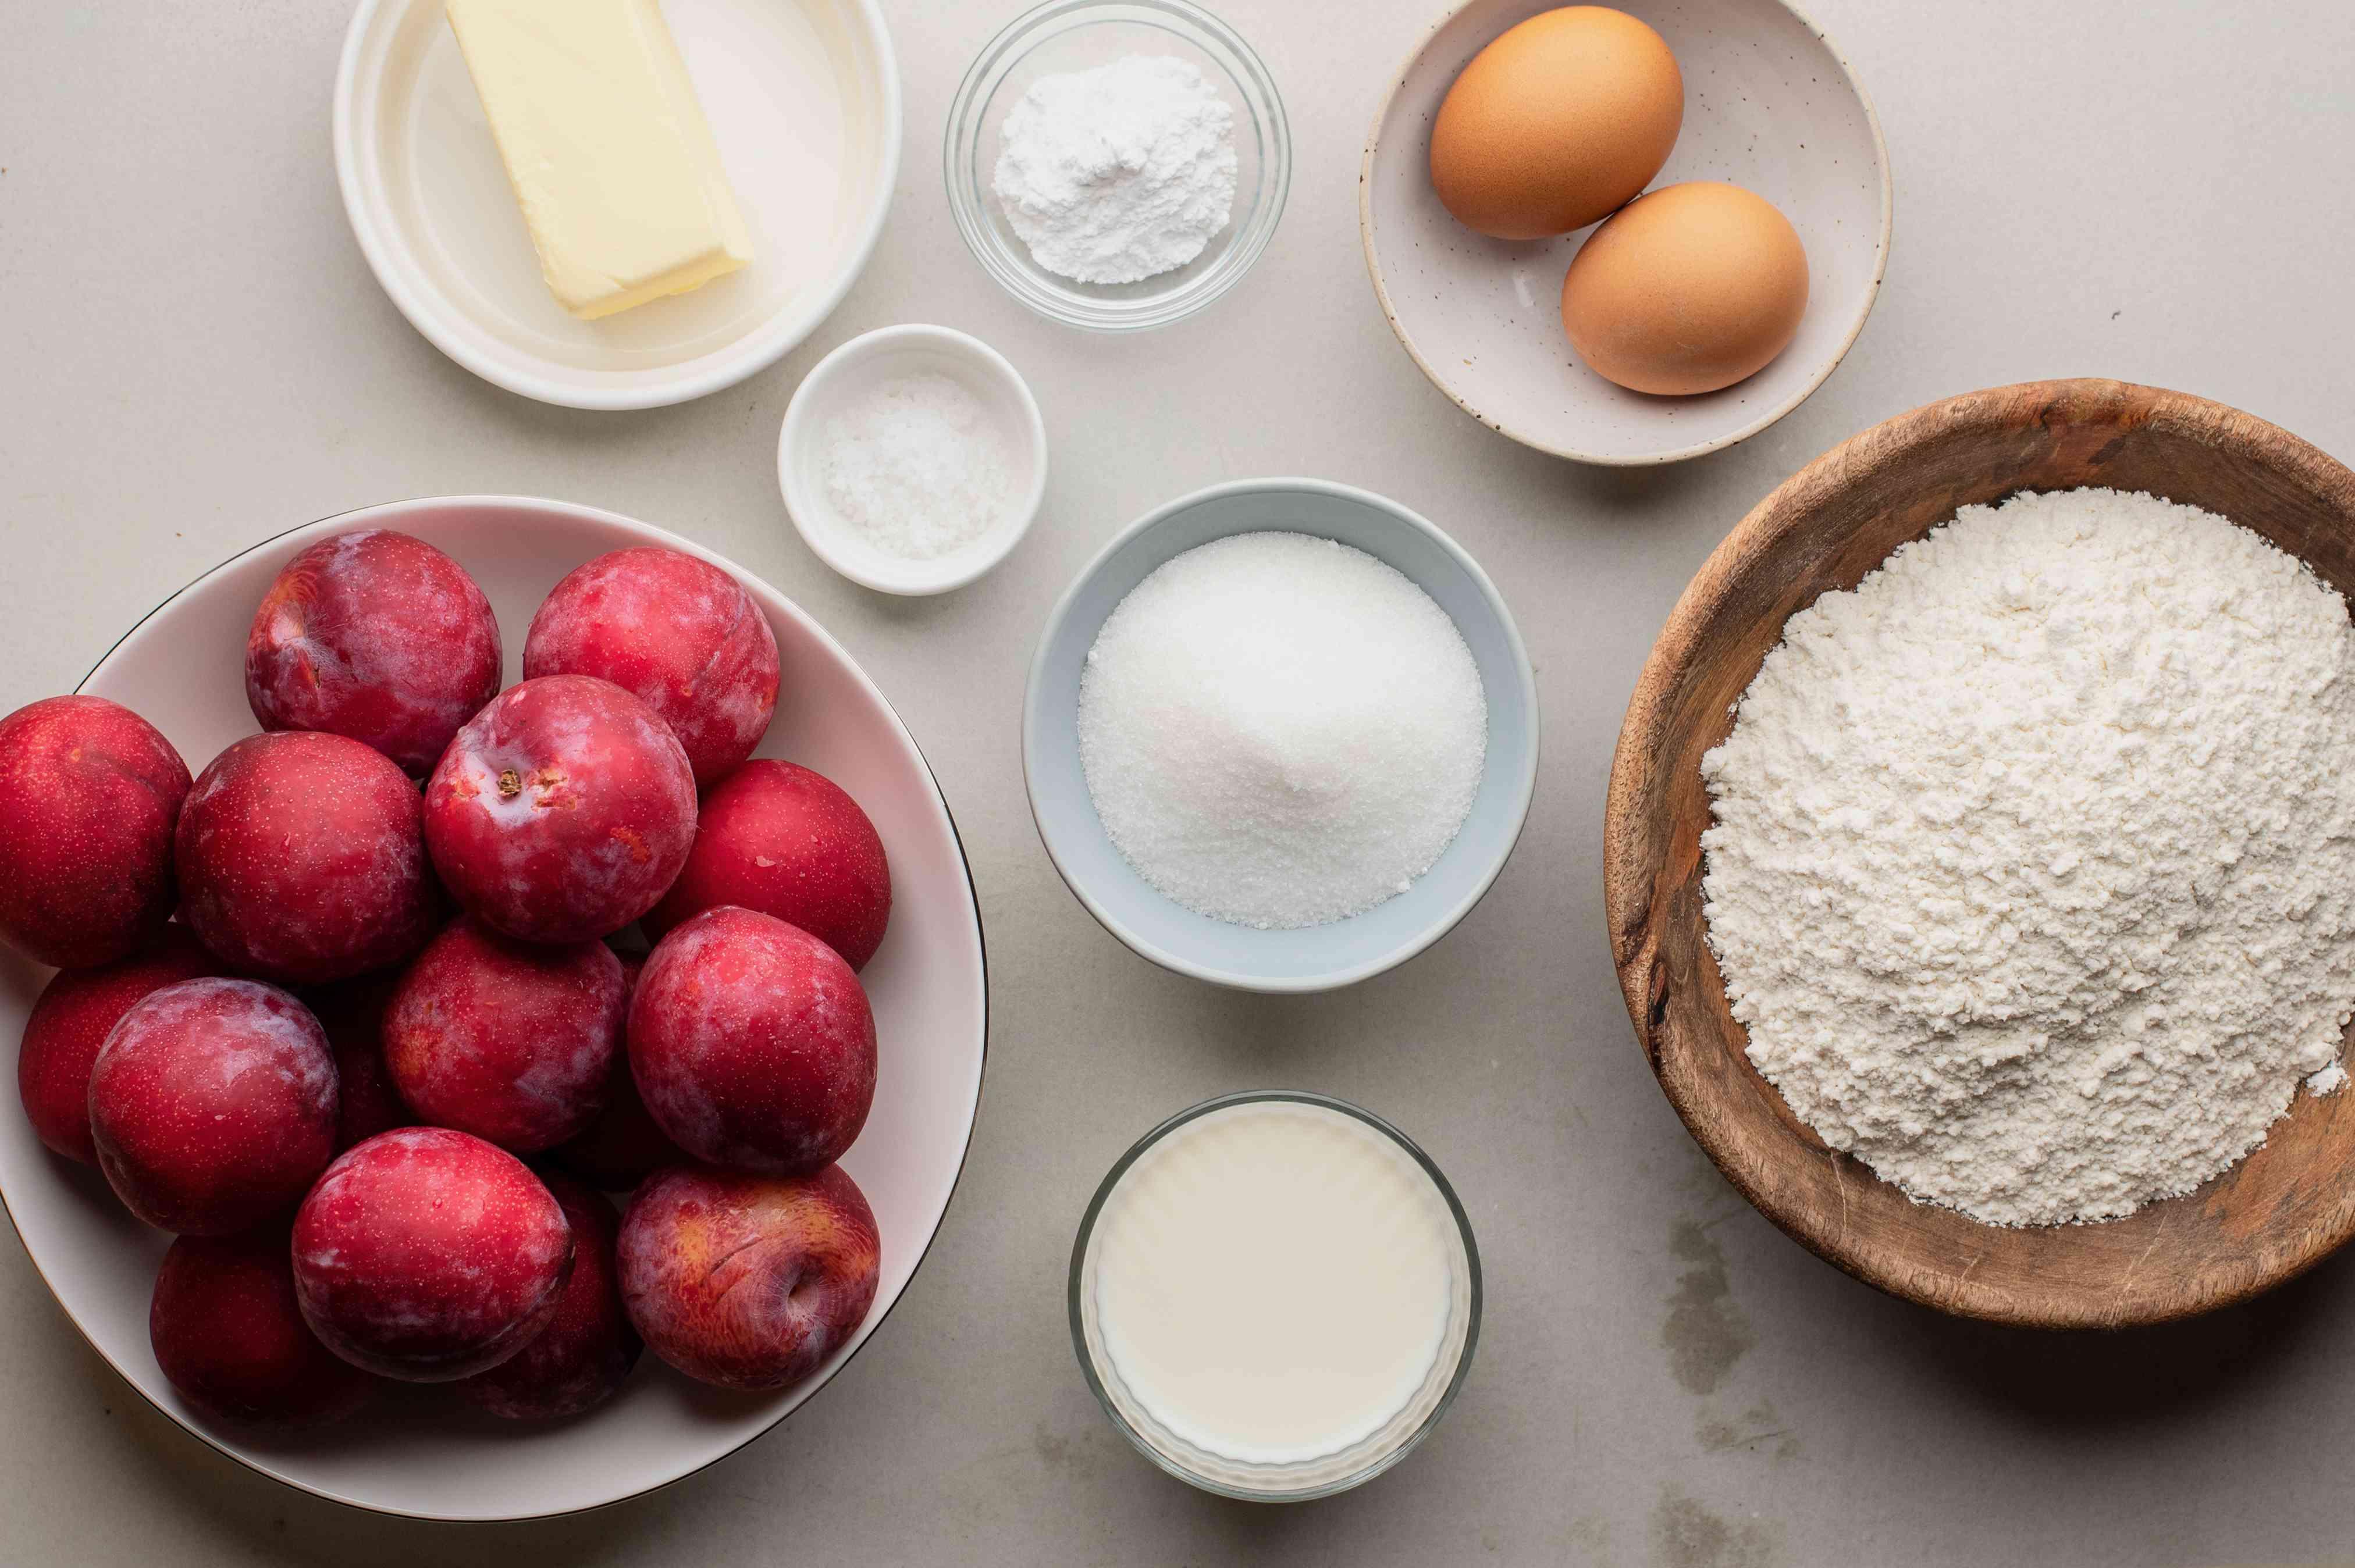 Ingredients for Polish plum cake recipe